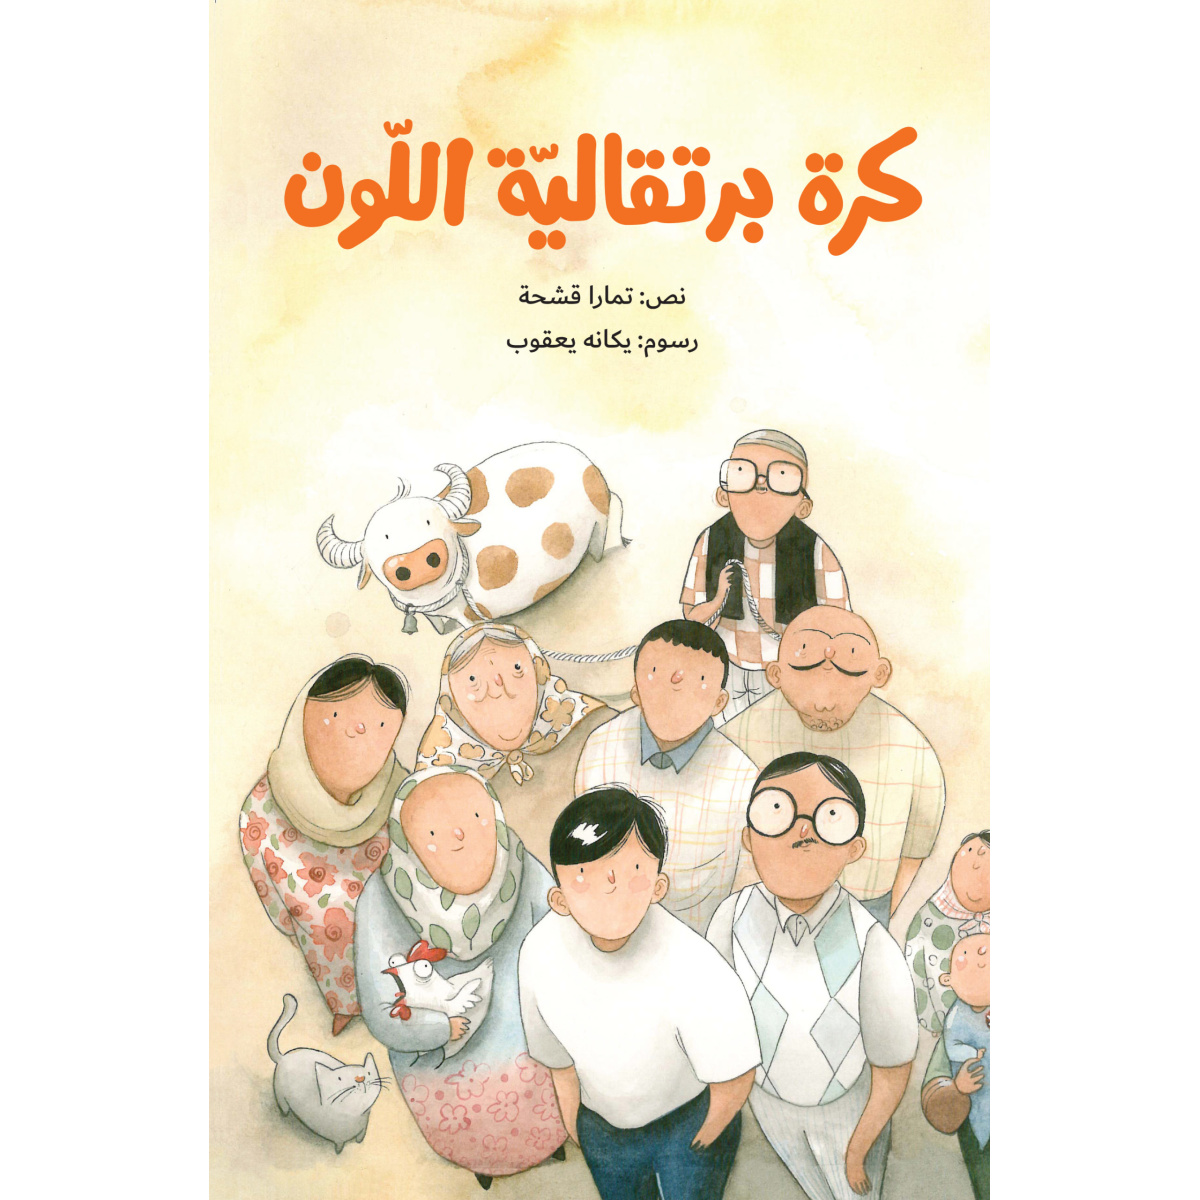 The Orange Ball scaled Dar Al Yasmine Publishing and Distribution